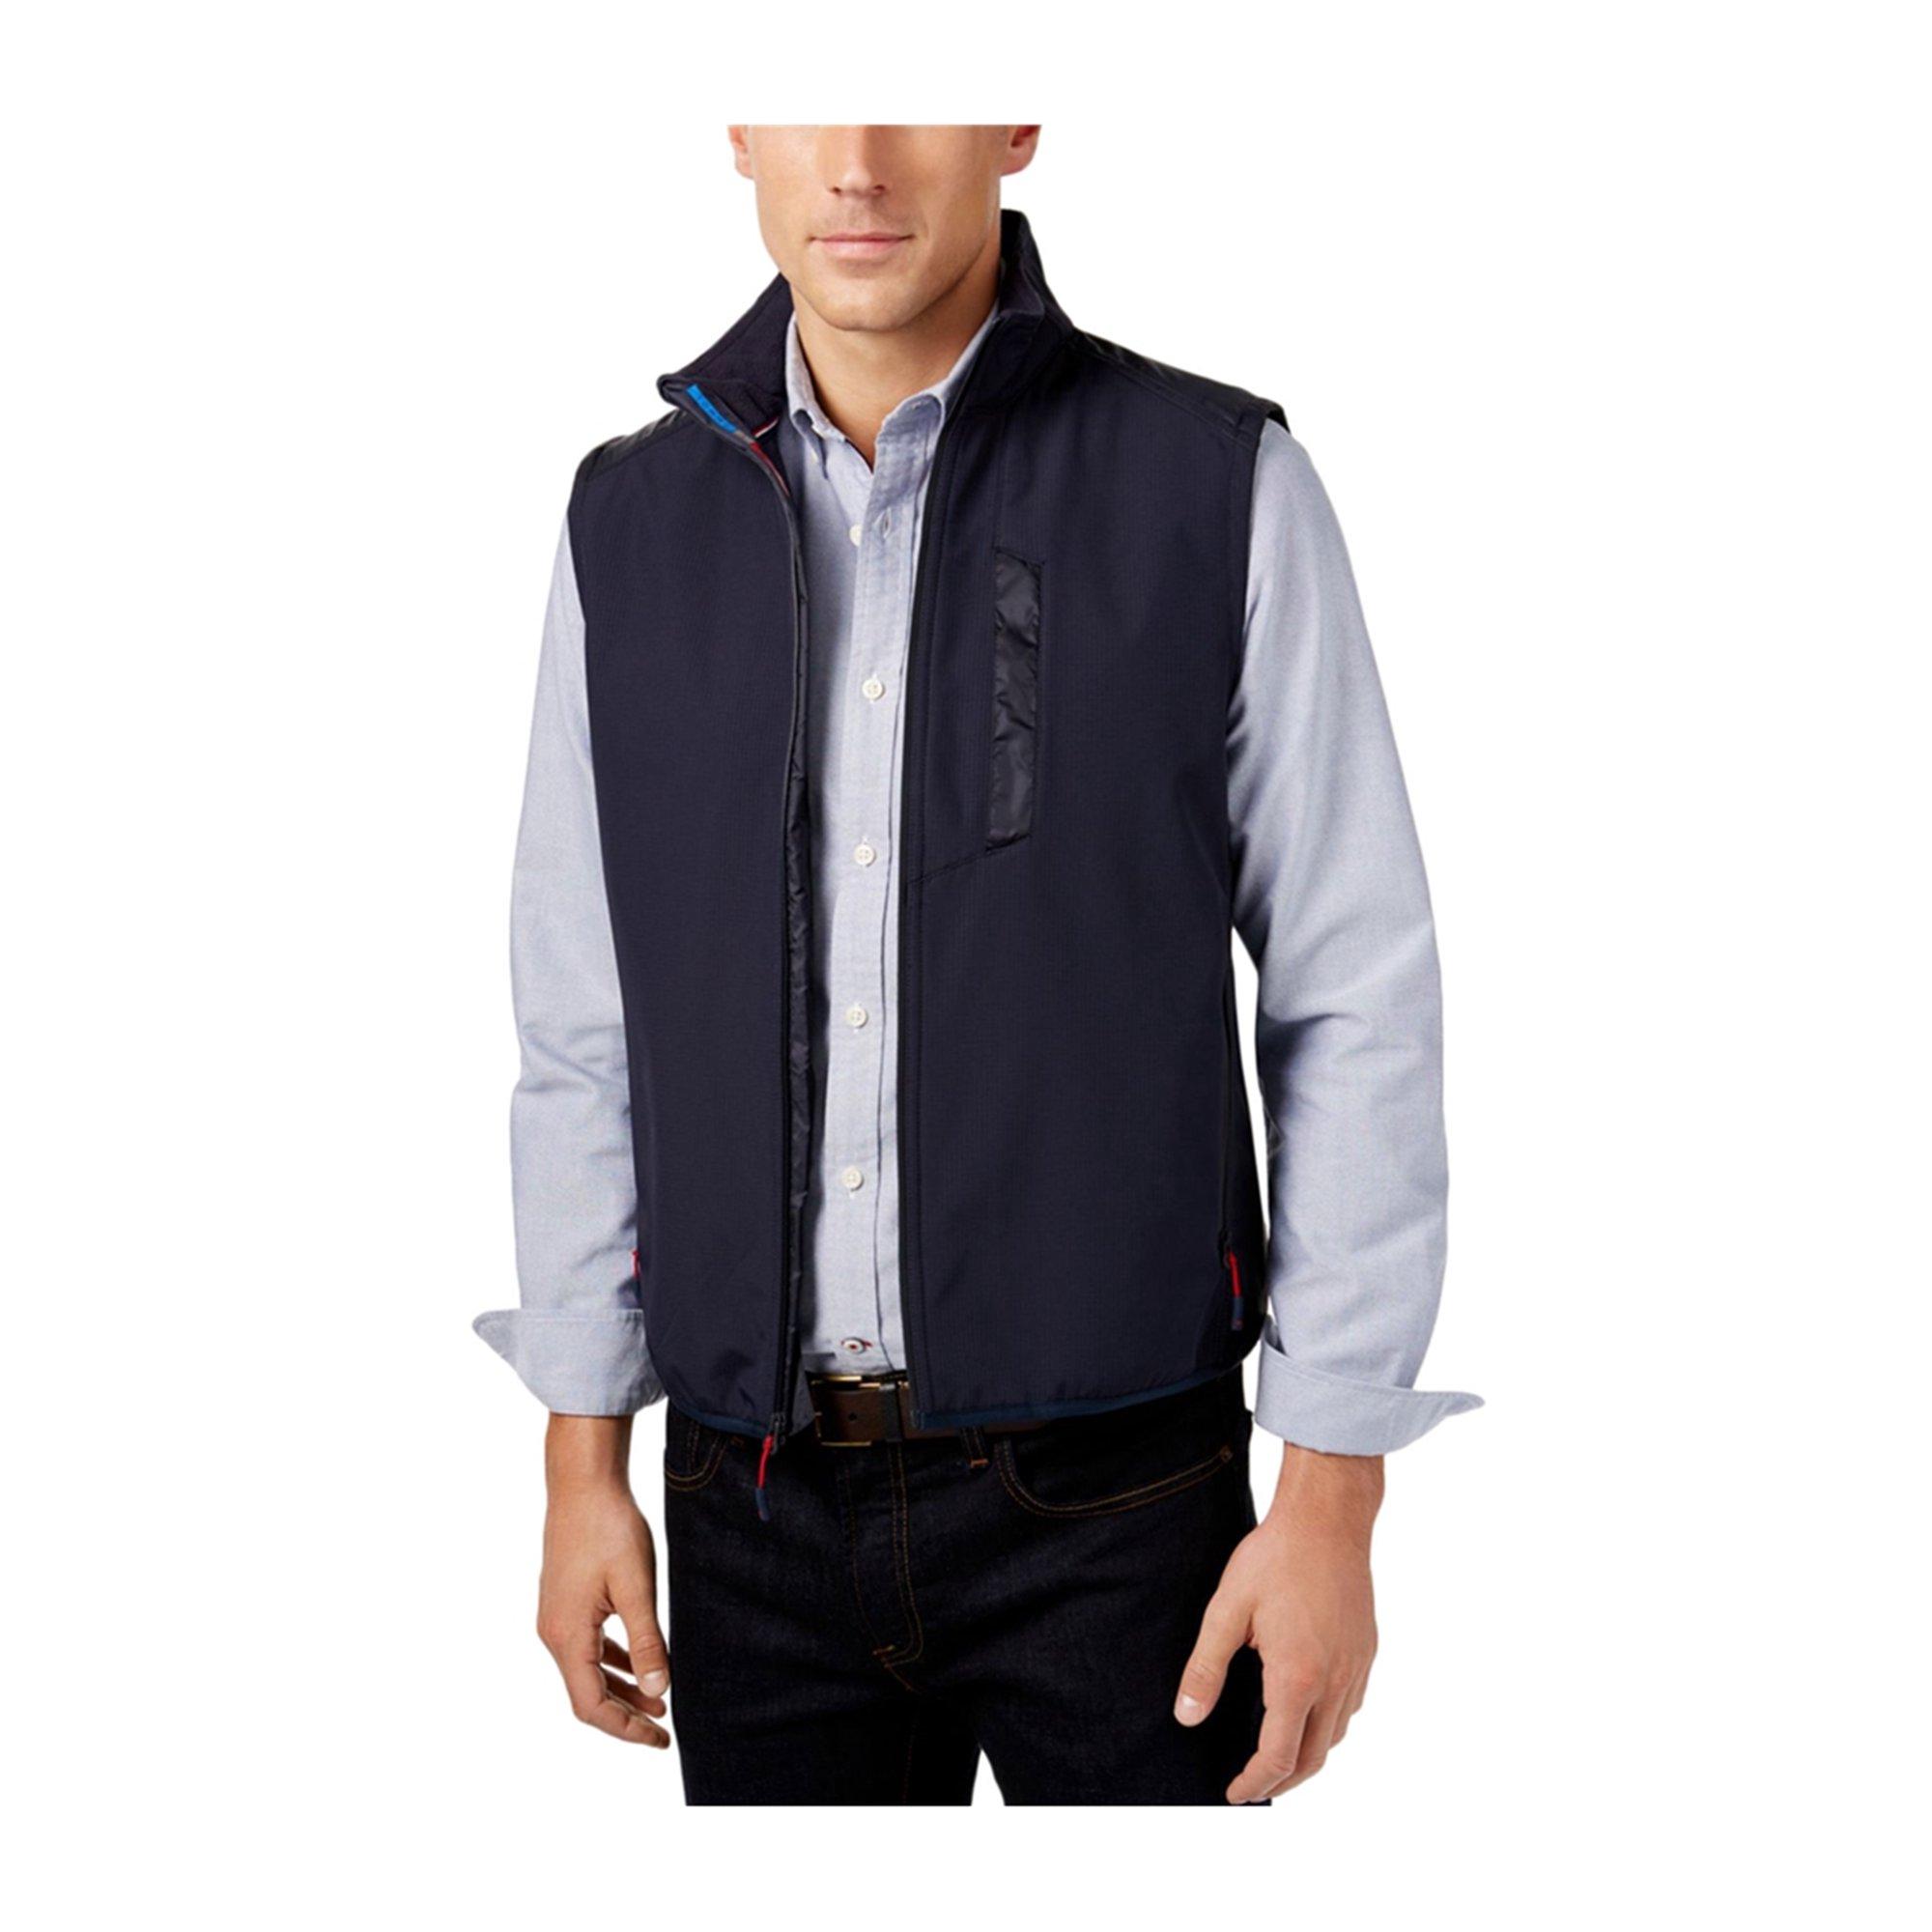 81b39510 Tommy Hilfiger Mens Competitor Windbreaker Vest 403 S | Walmart Canada